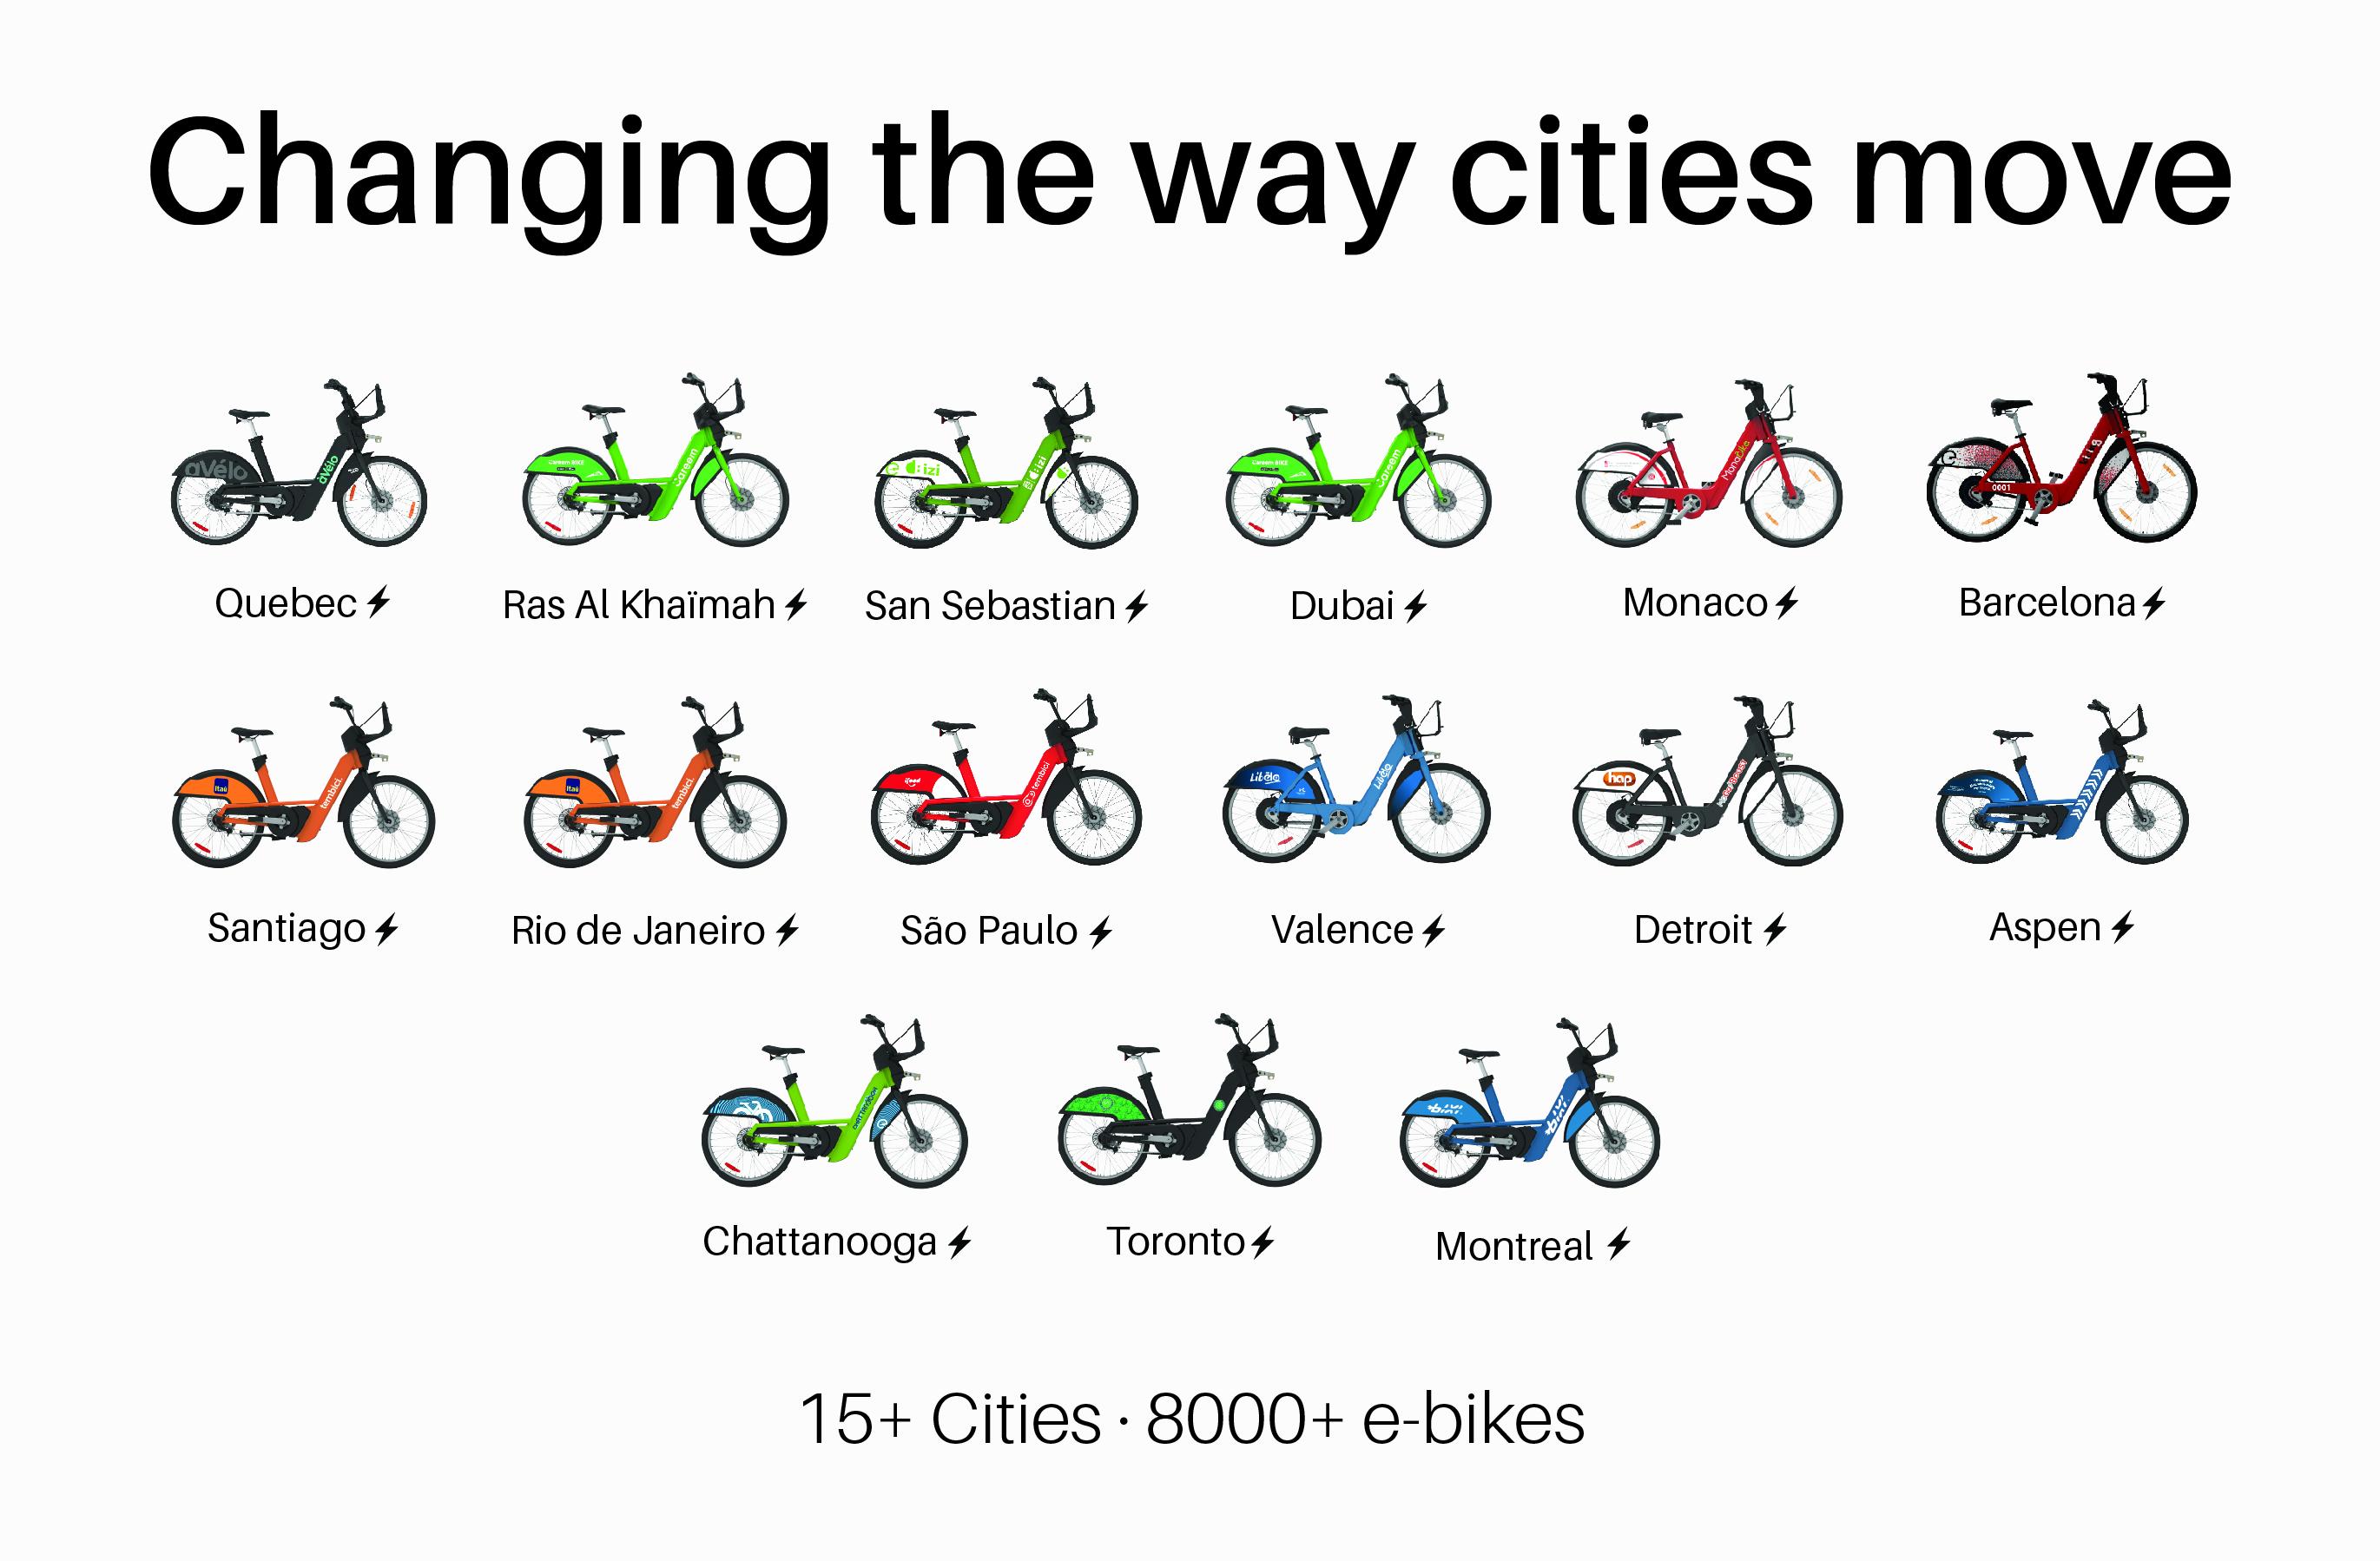 Electric-villes_et_velo_blog-01.jpg (2.61 MB)